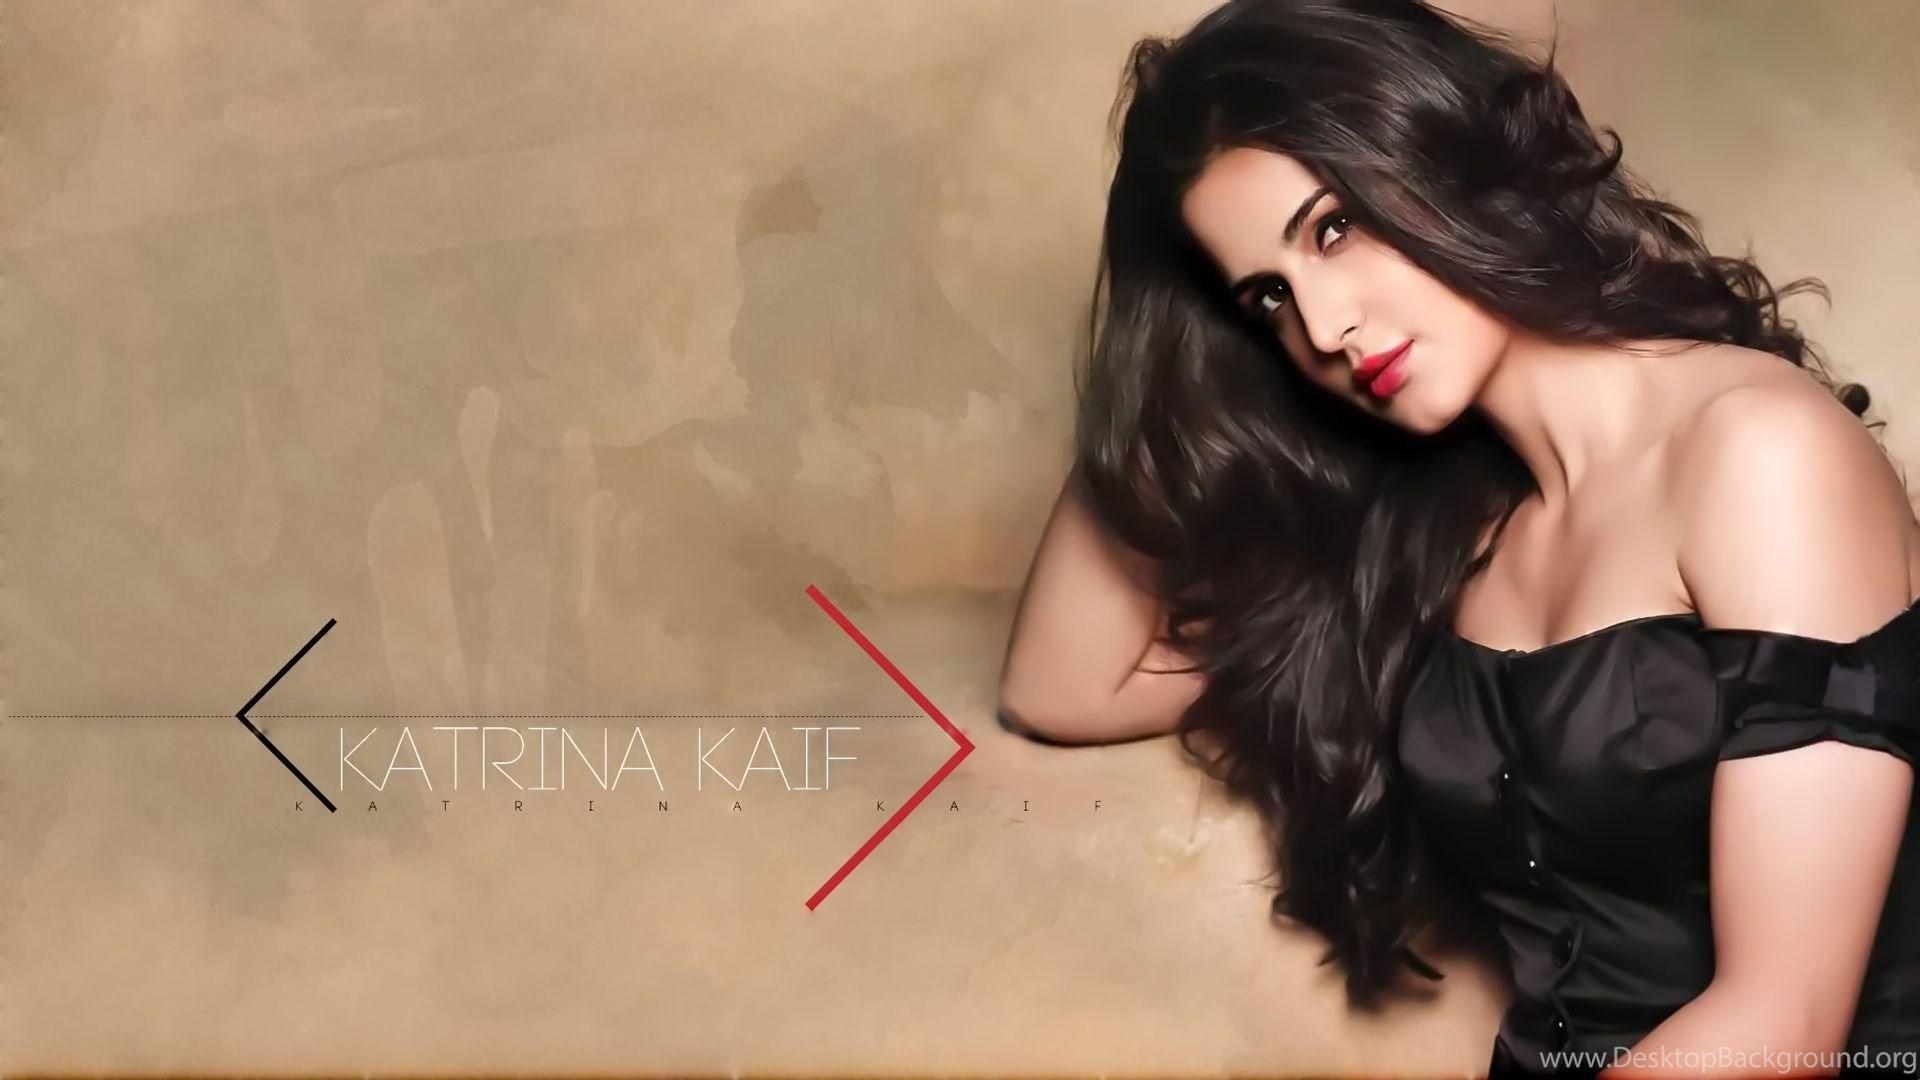 katrina kaif wallpapers download free wallpapers hd fine desktop background desktopbackground org